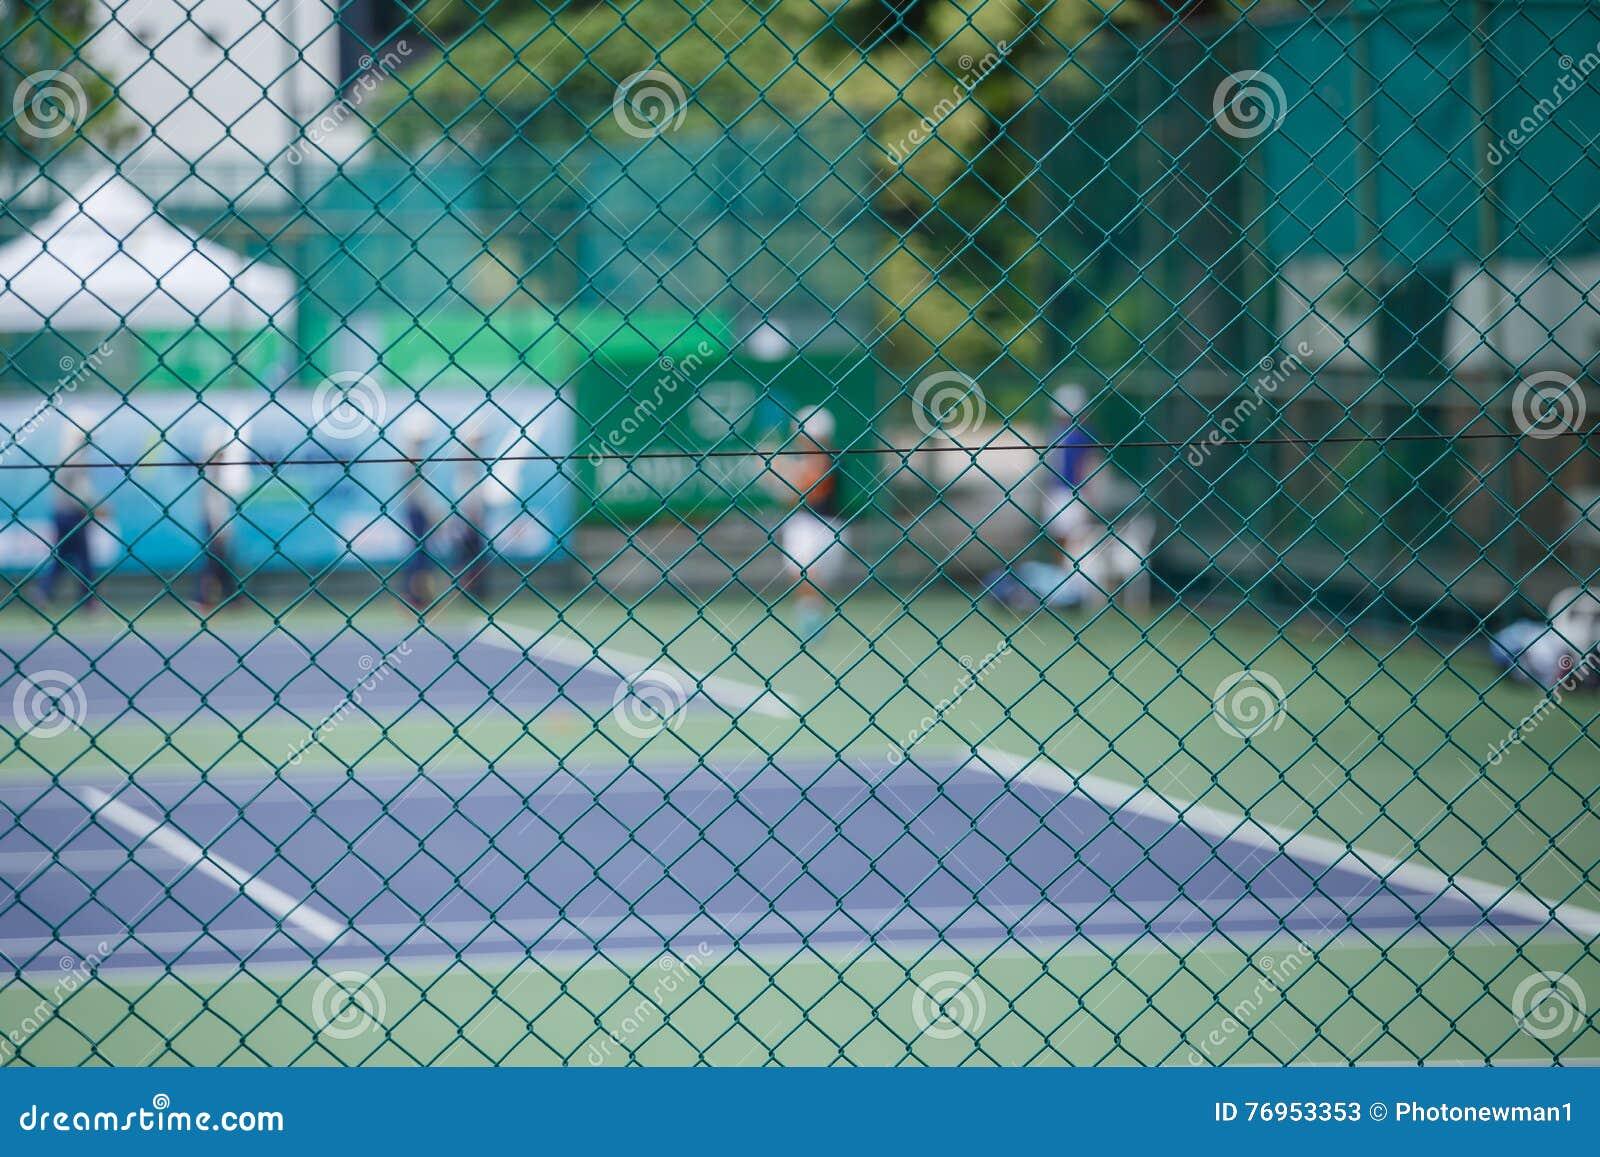 Stålingreppsstaket av tennisbanorna